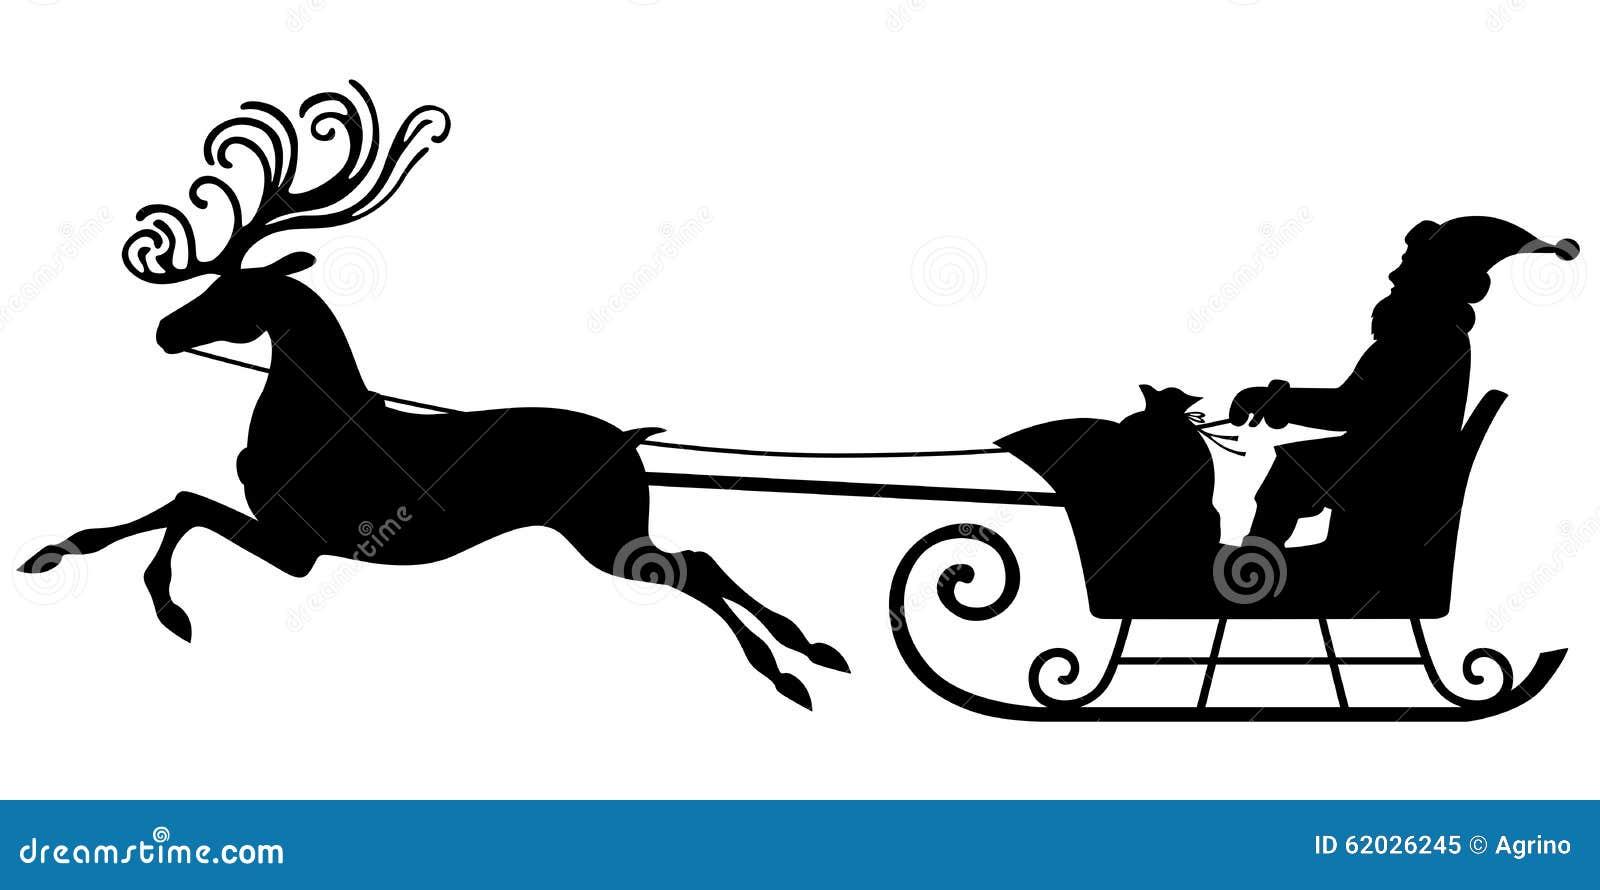 santa claus riding on a reindeer sleigh stock vector illustration